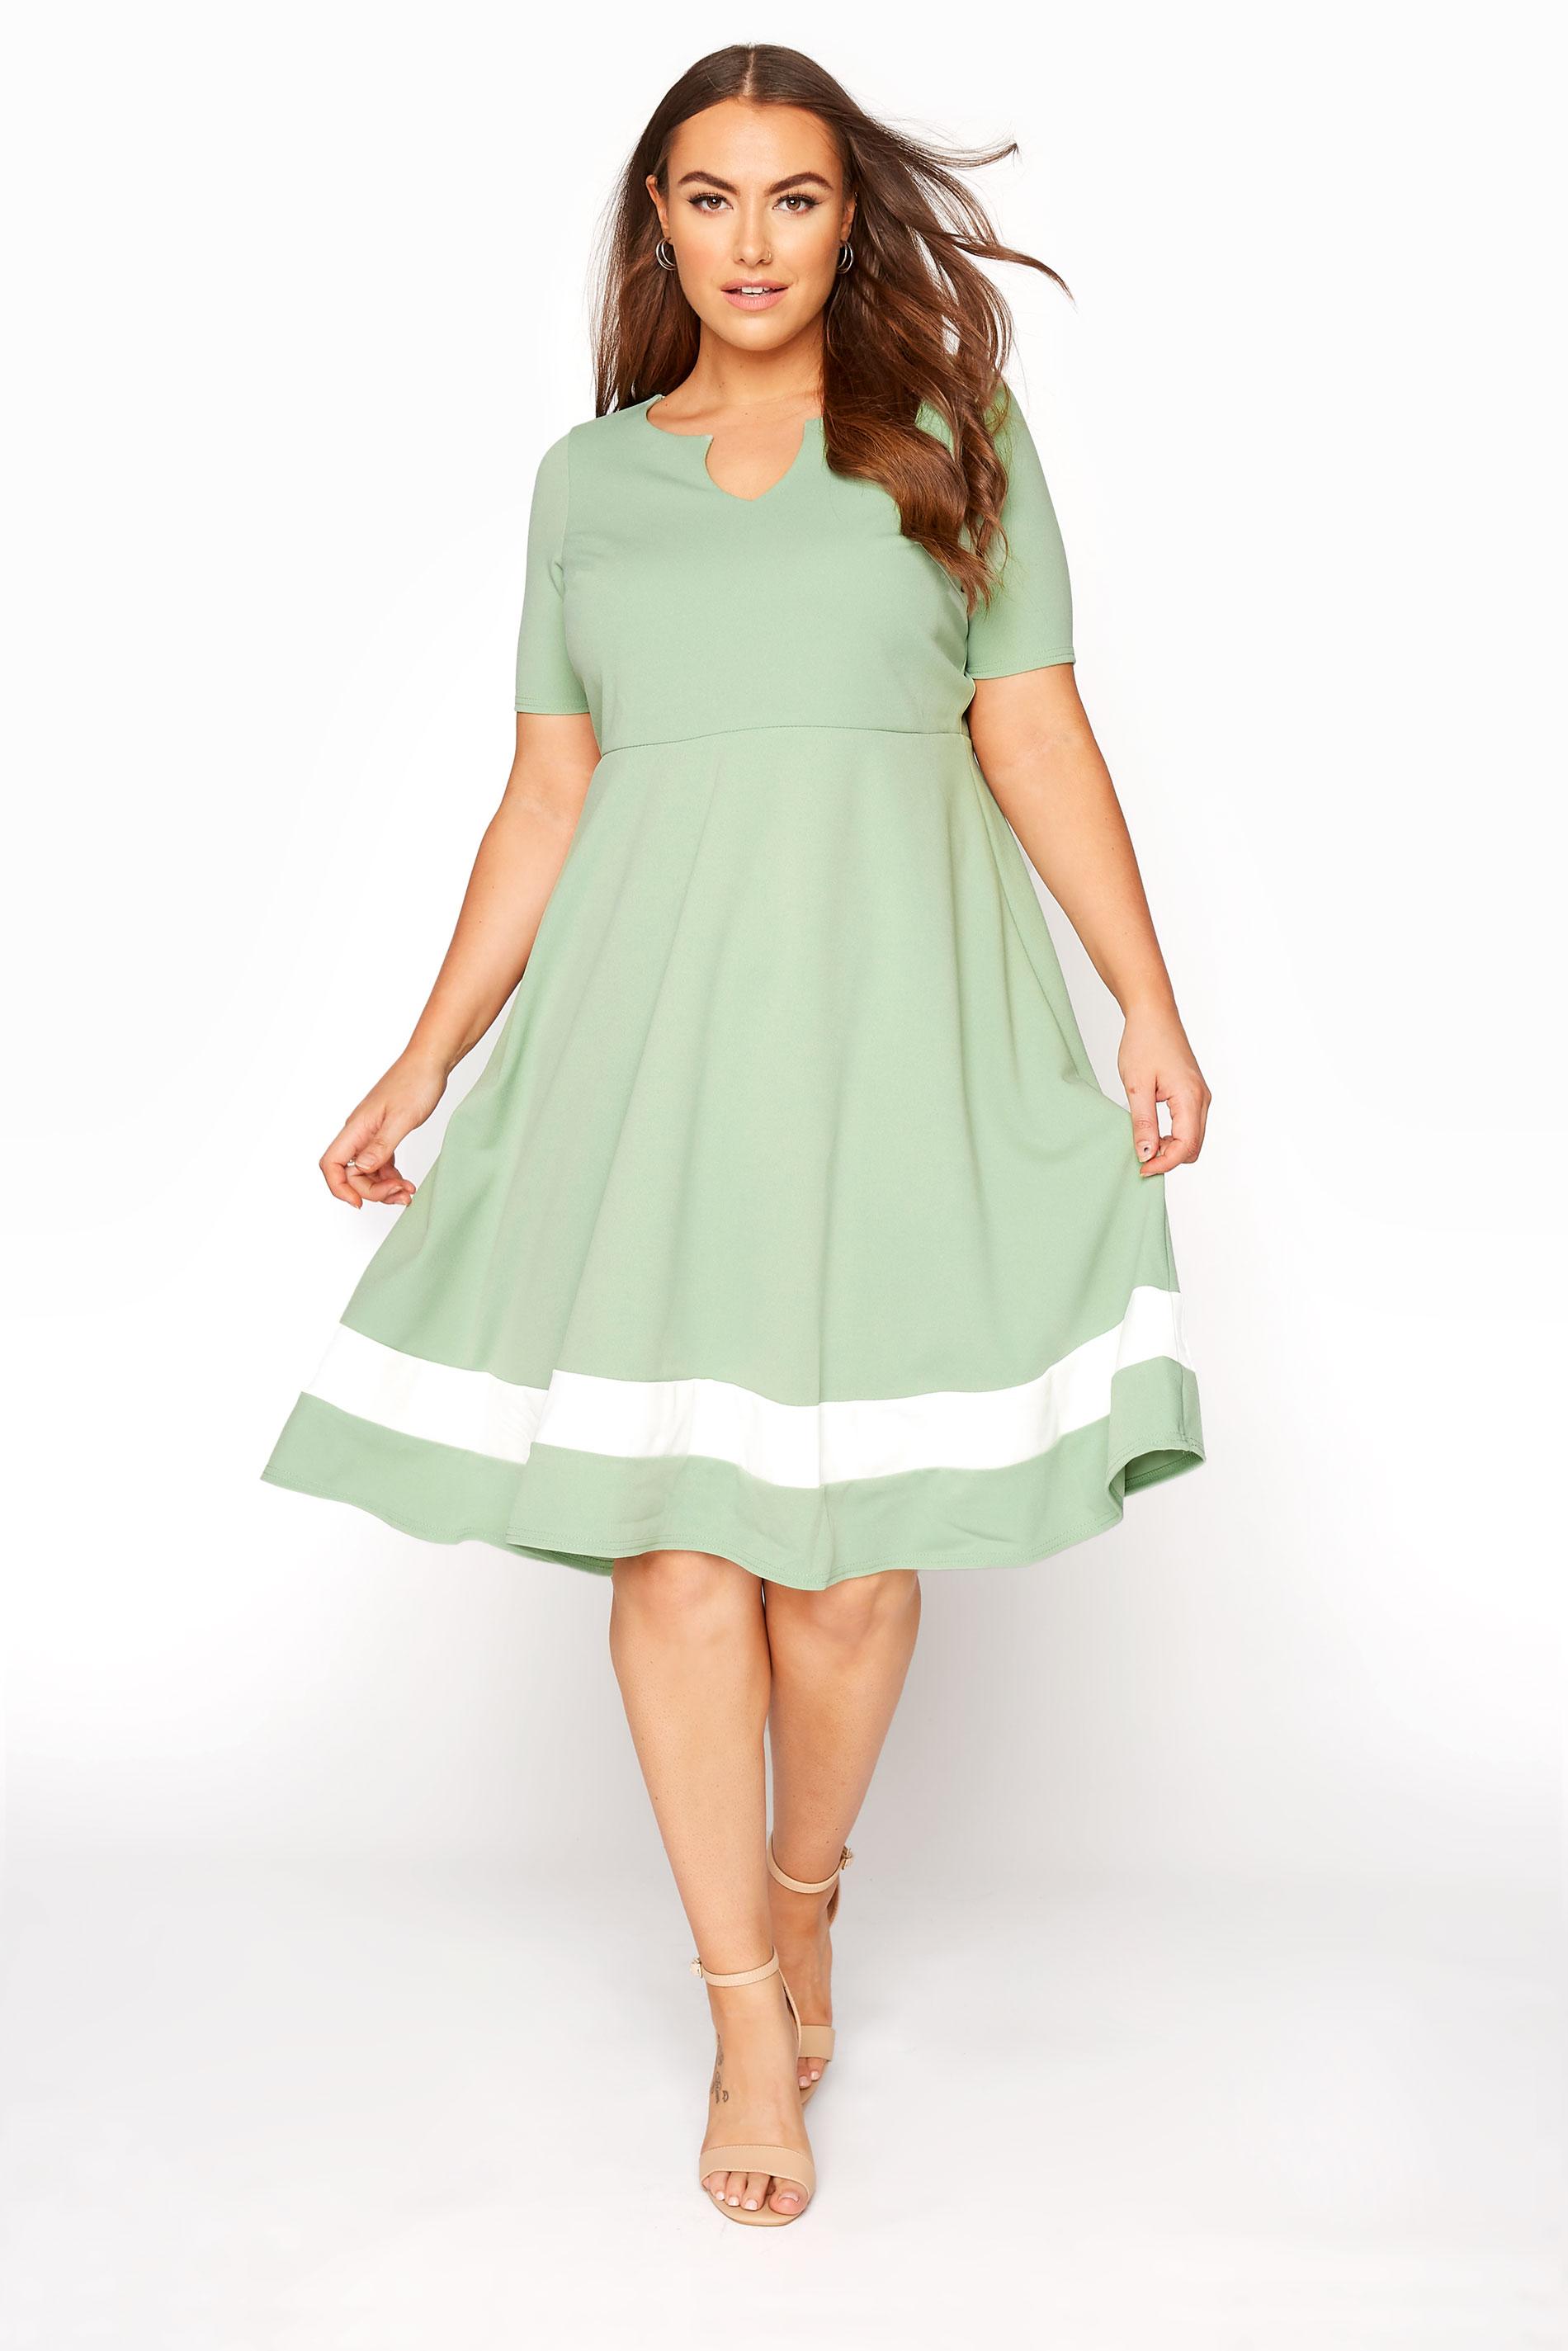 YOURS LONDON Sage Green Notch Neck Skater Dress